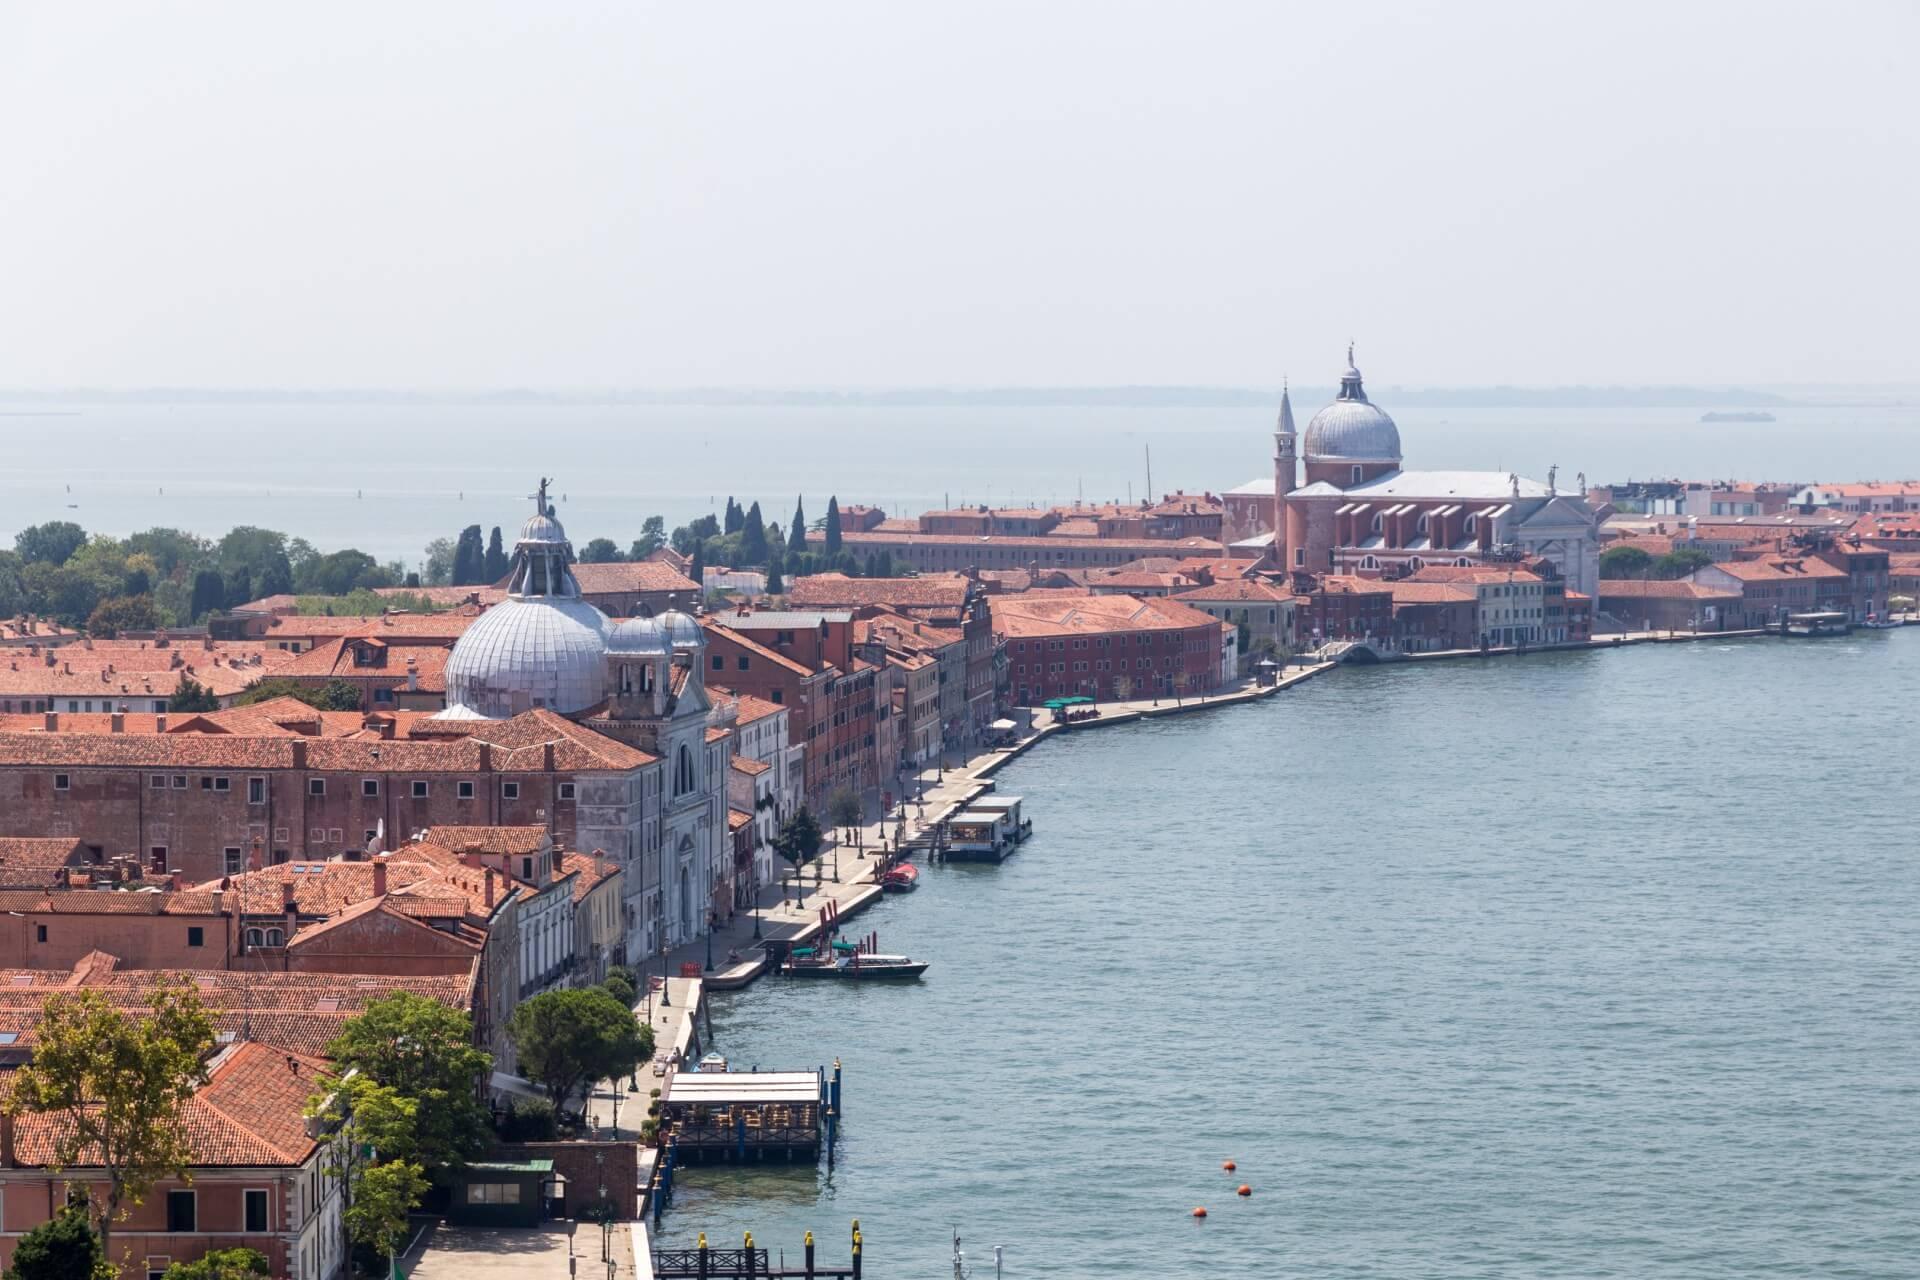 Giudecca von San Giorgio aus gesehen